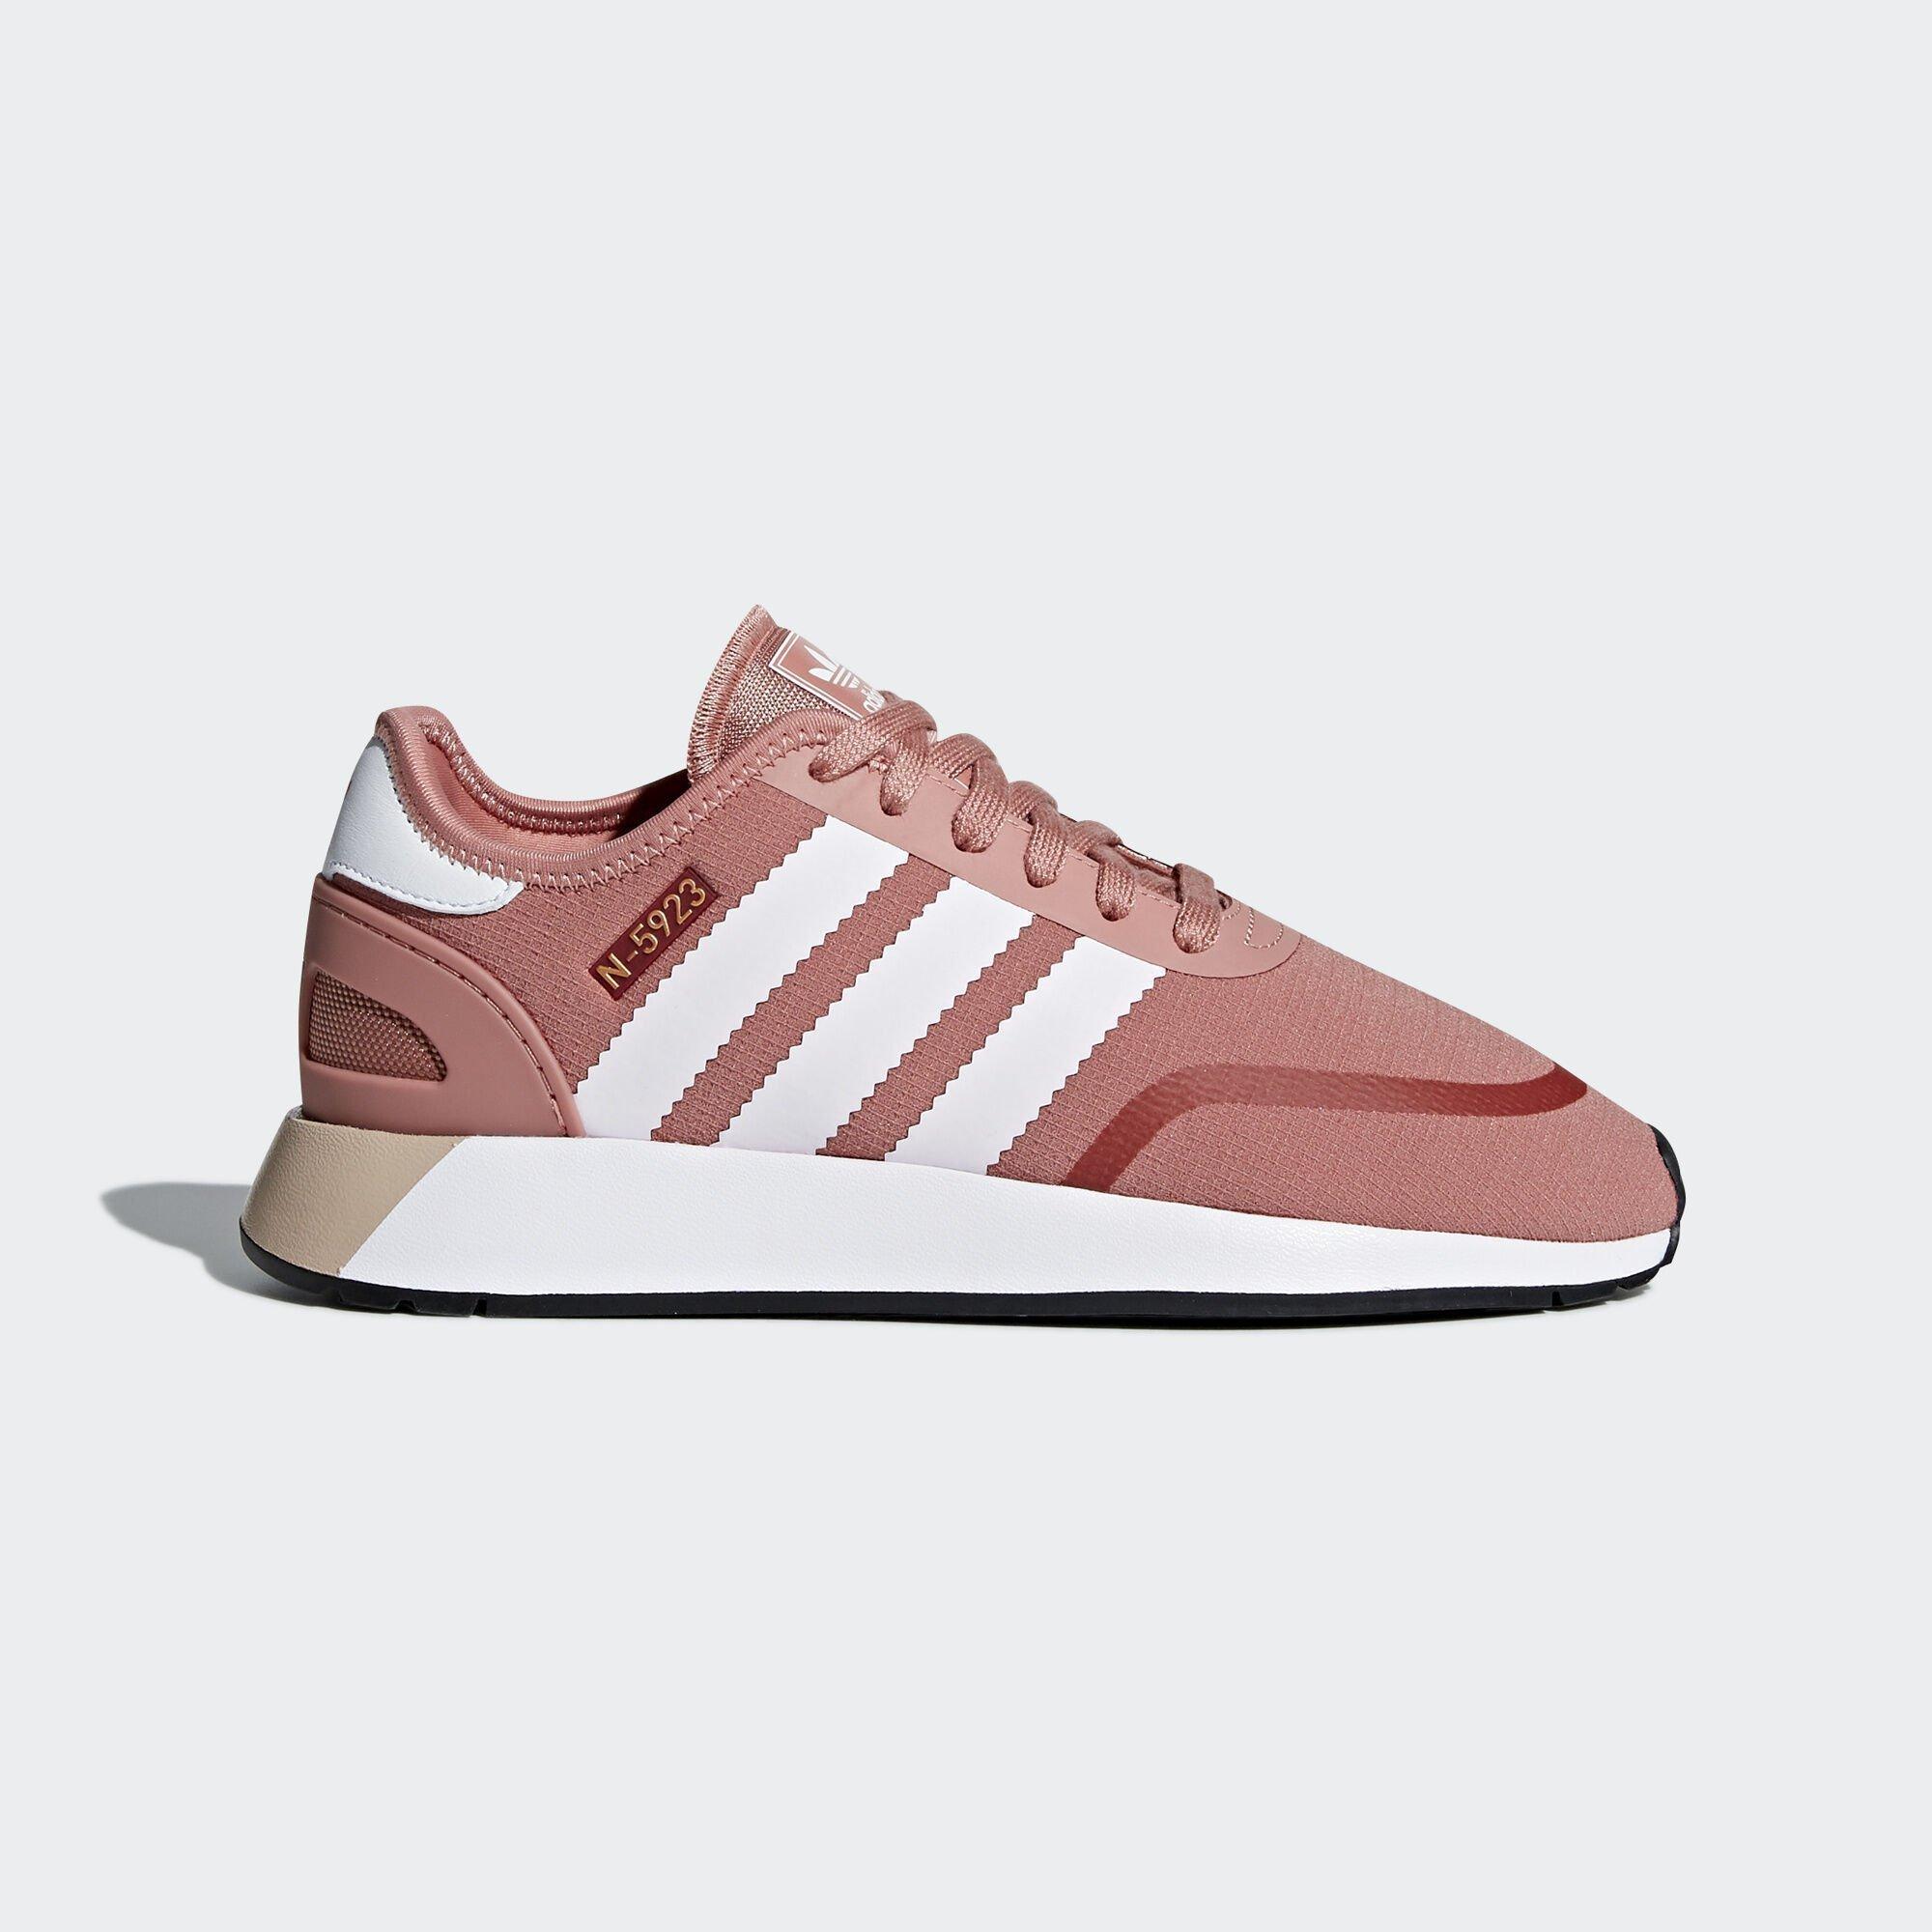 adidas N-5923 Ash Pink White (W) (AQ0267)